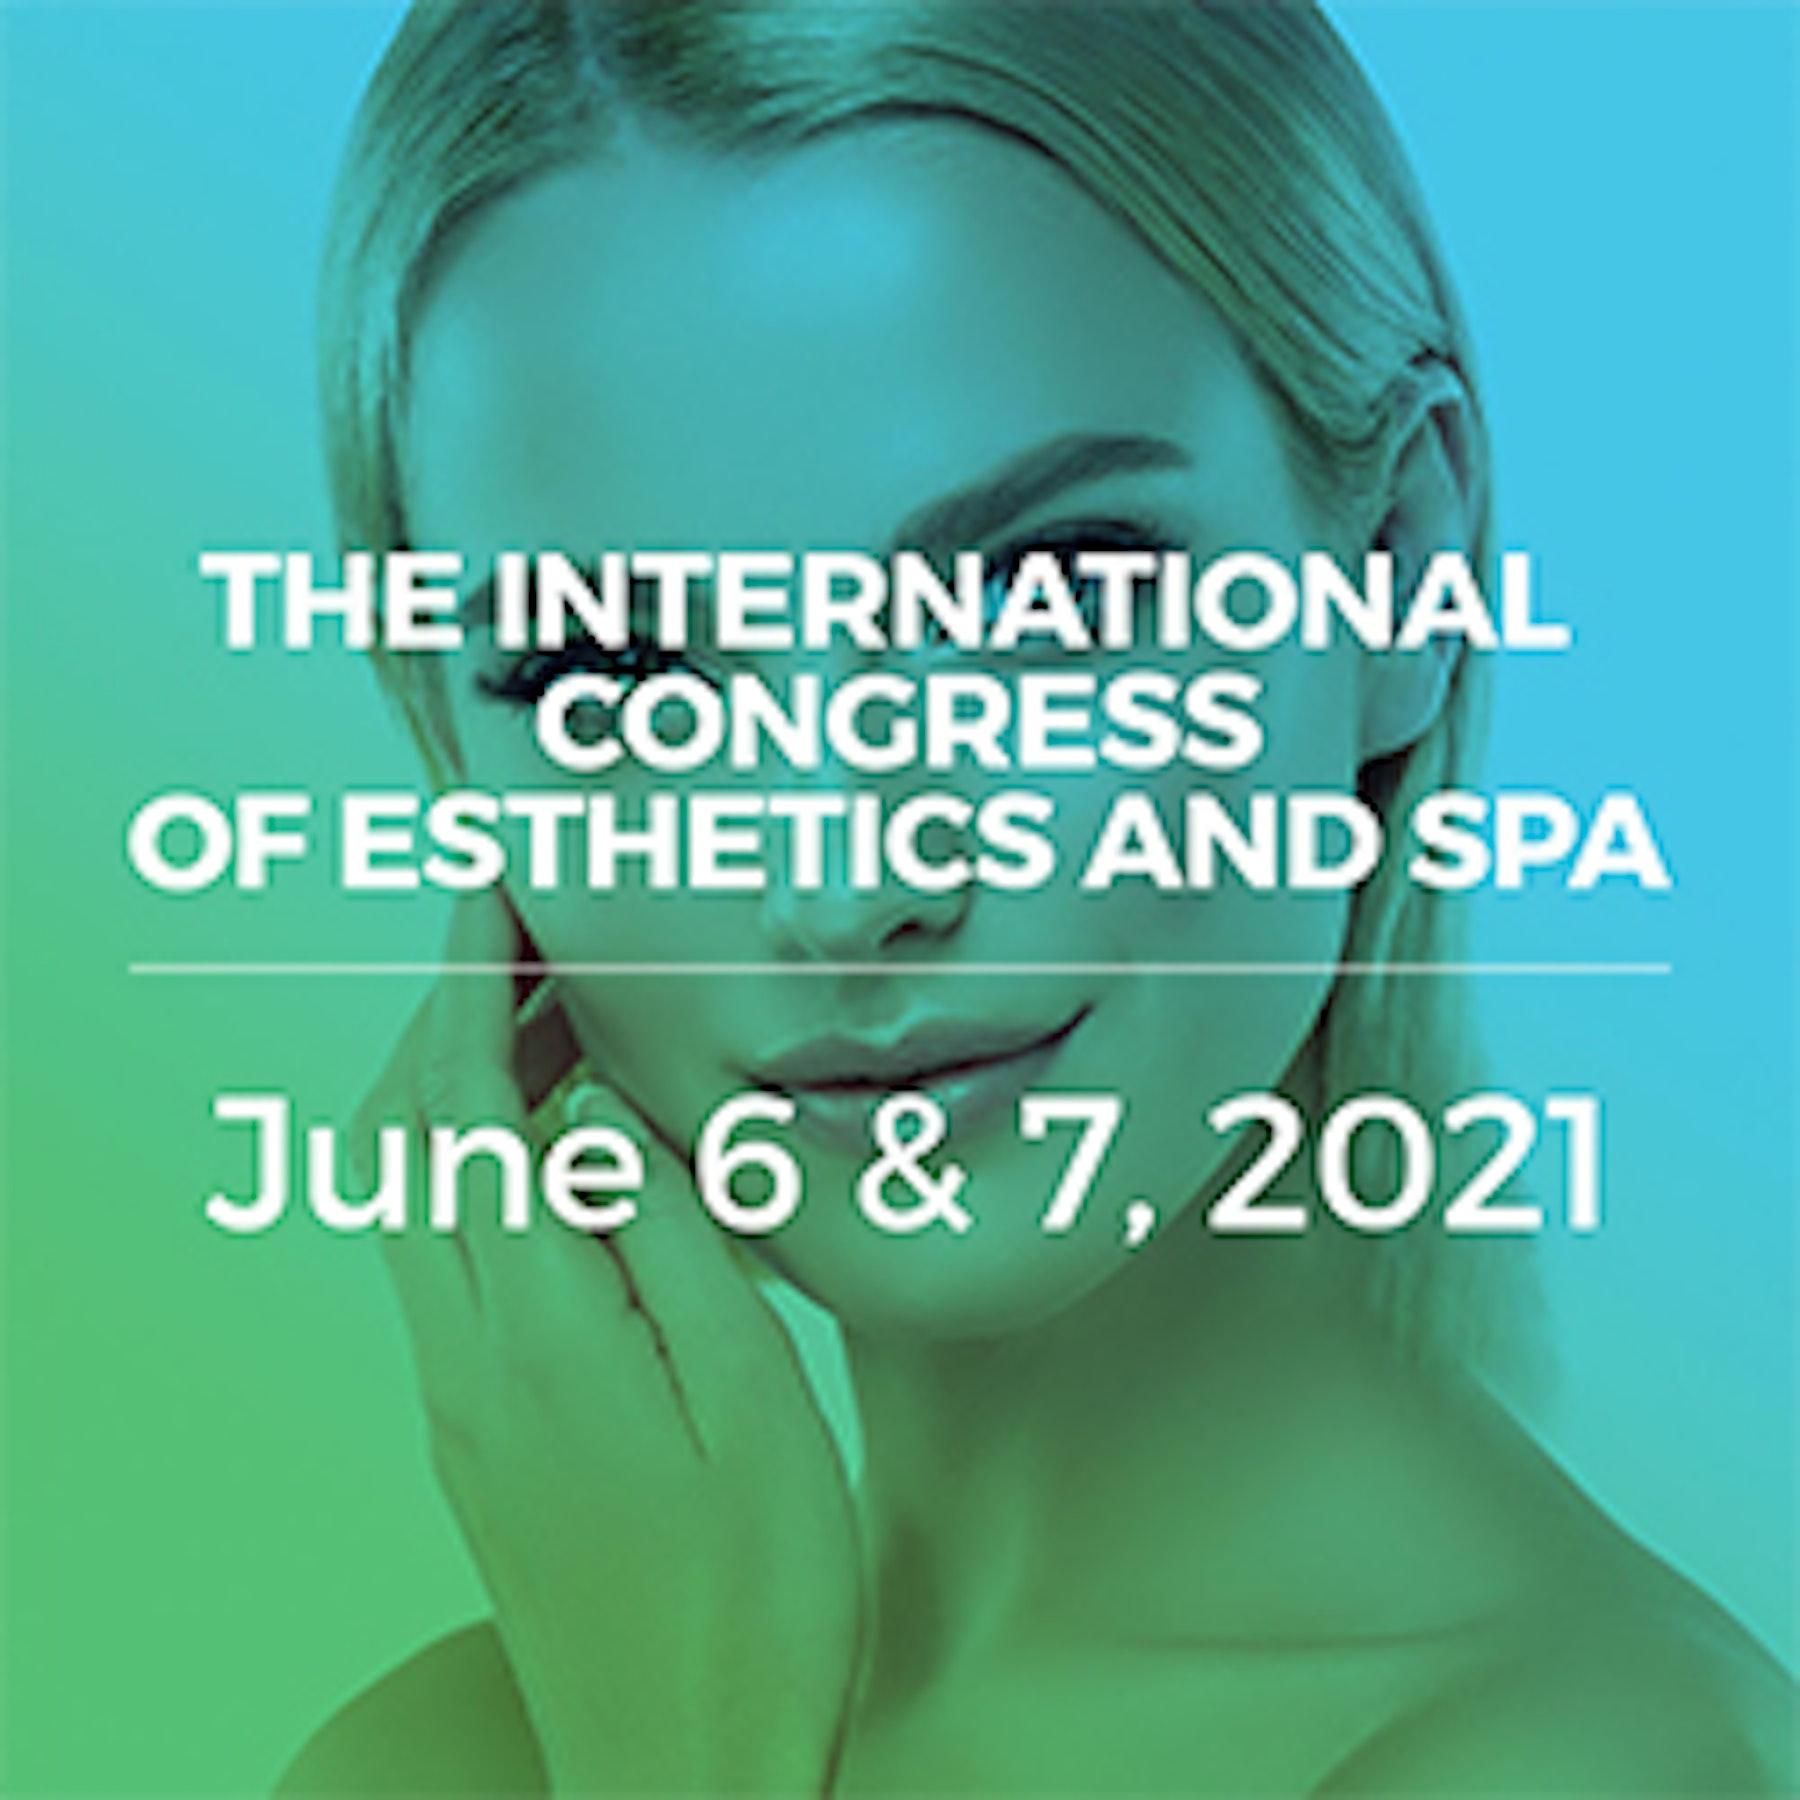 International Congress of Esthetics and Spa Logo